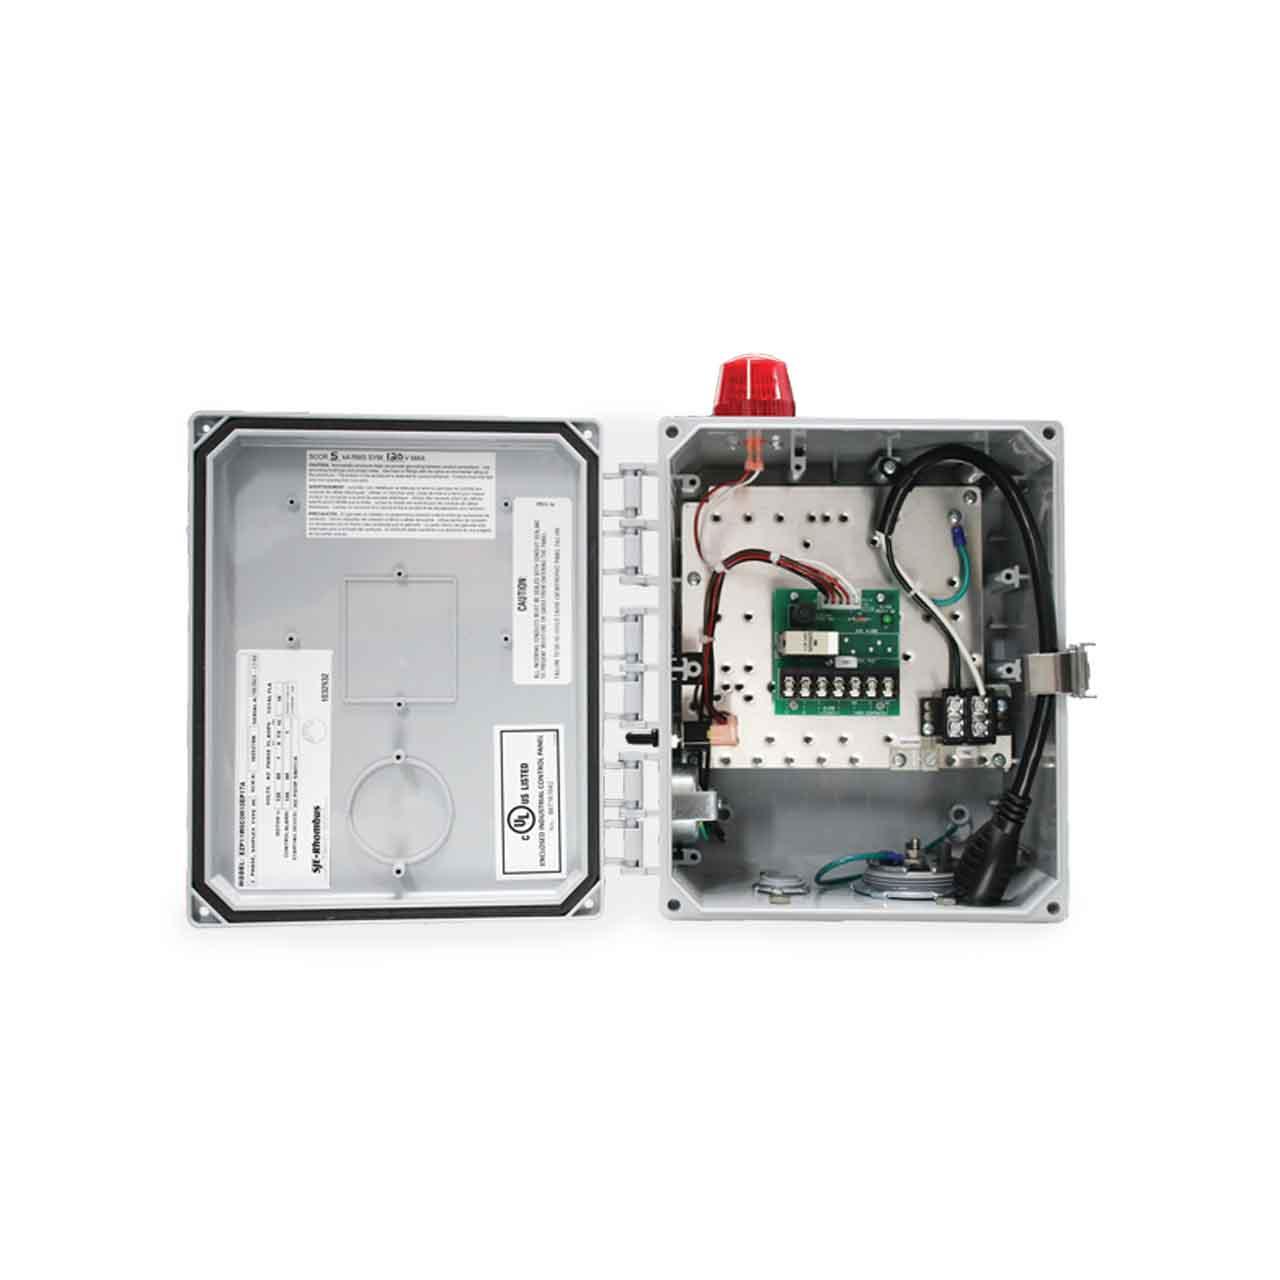 hight resolution of sje rhombus sje rhombus ezp series plugger plug in pump control panel cp sjeezp